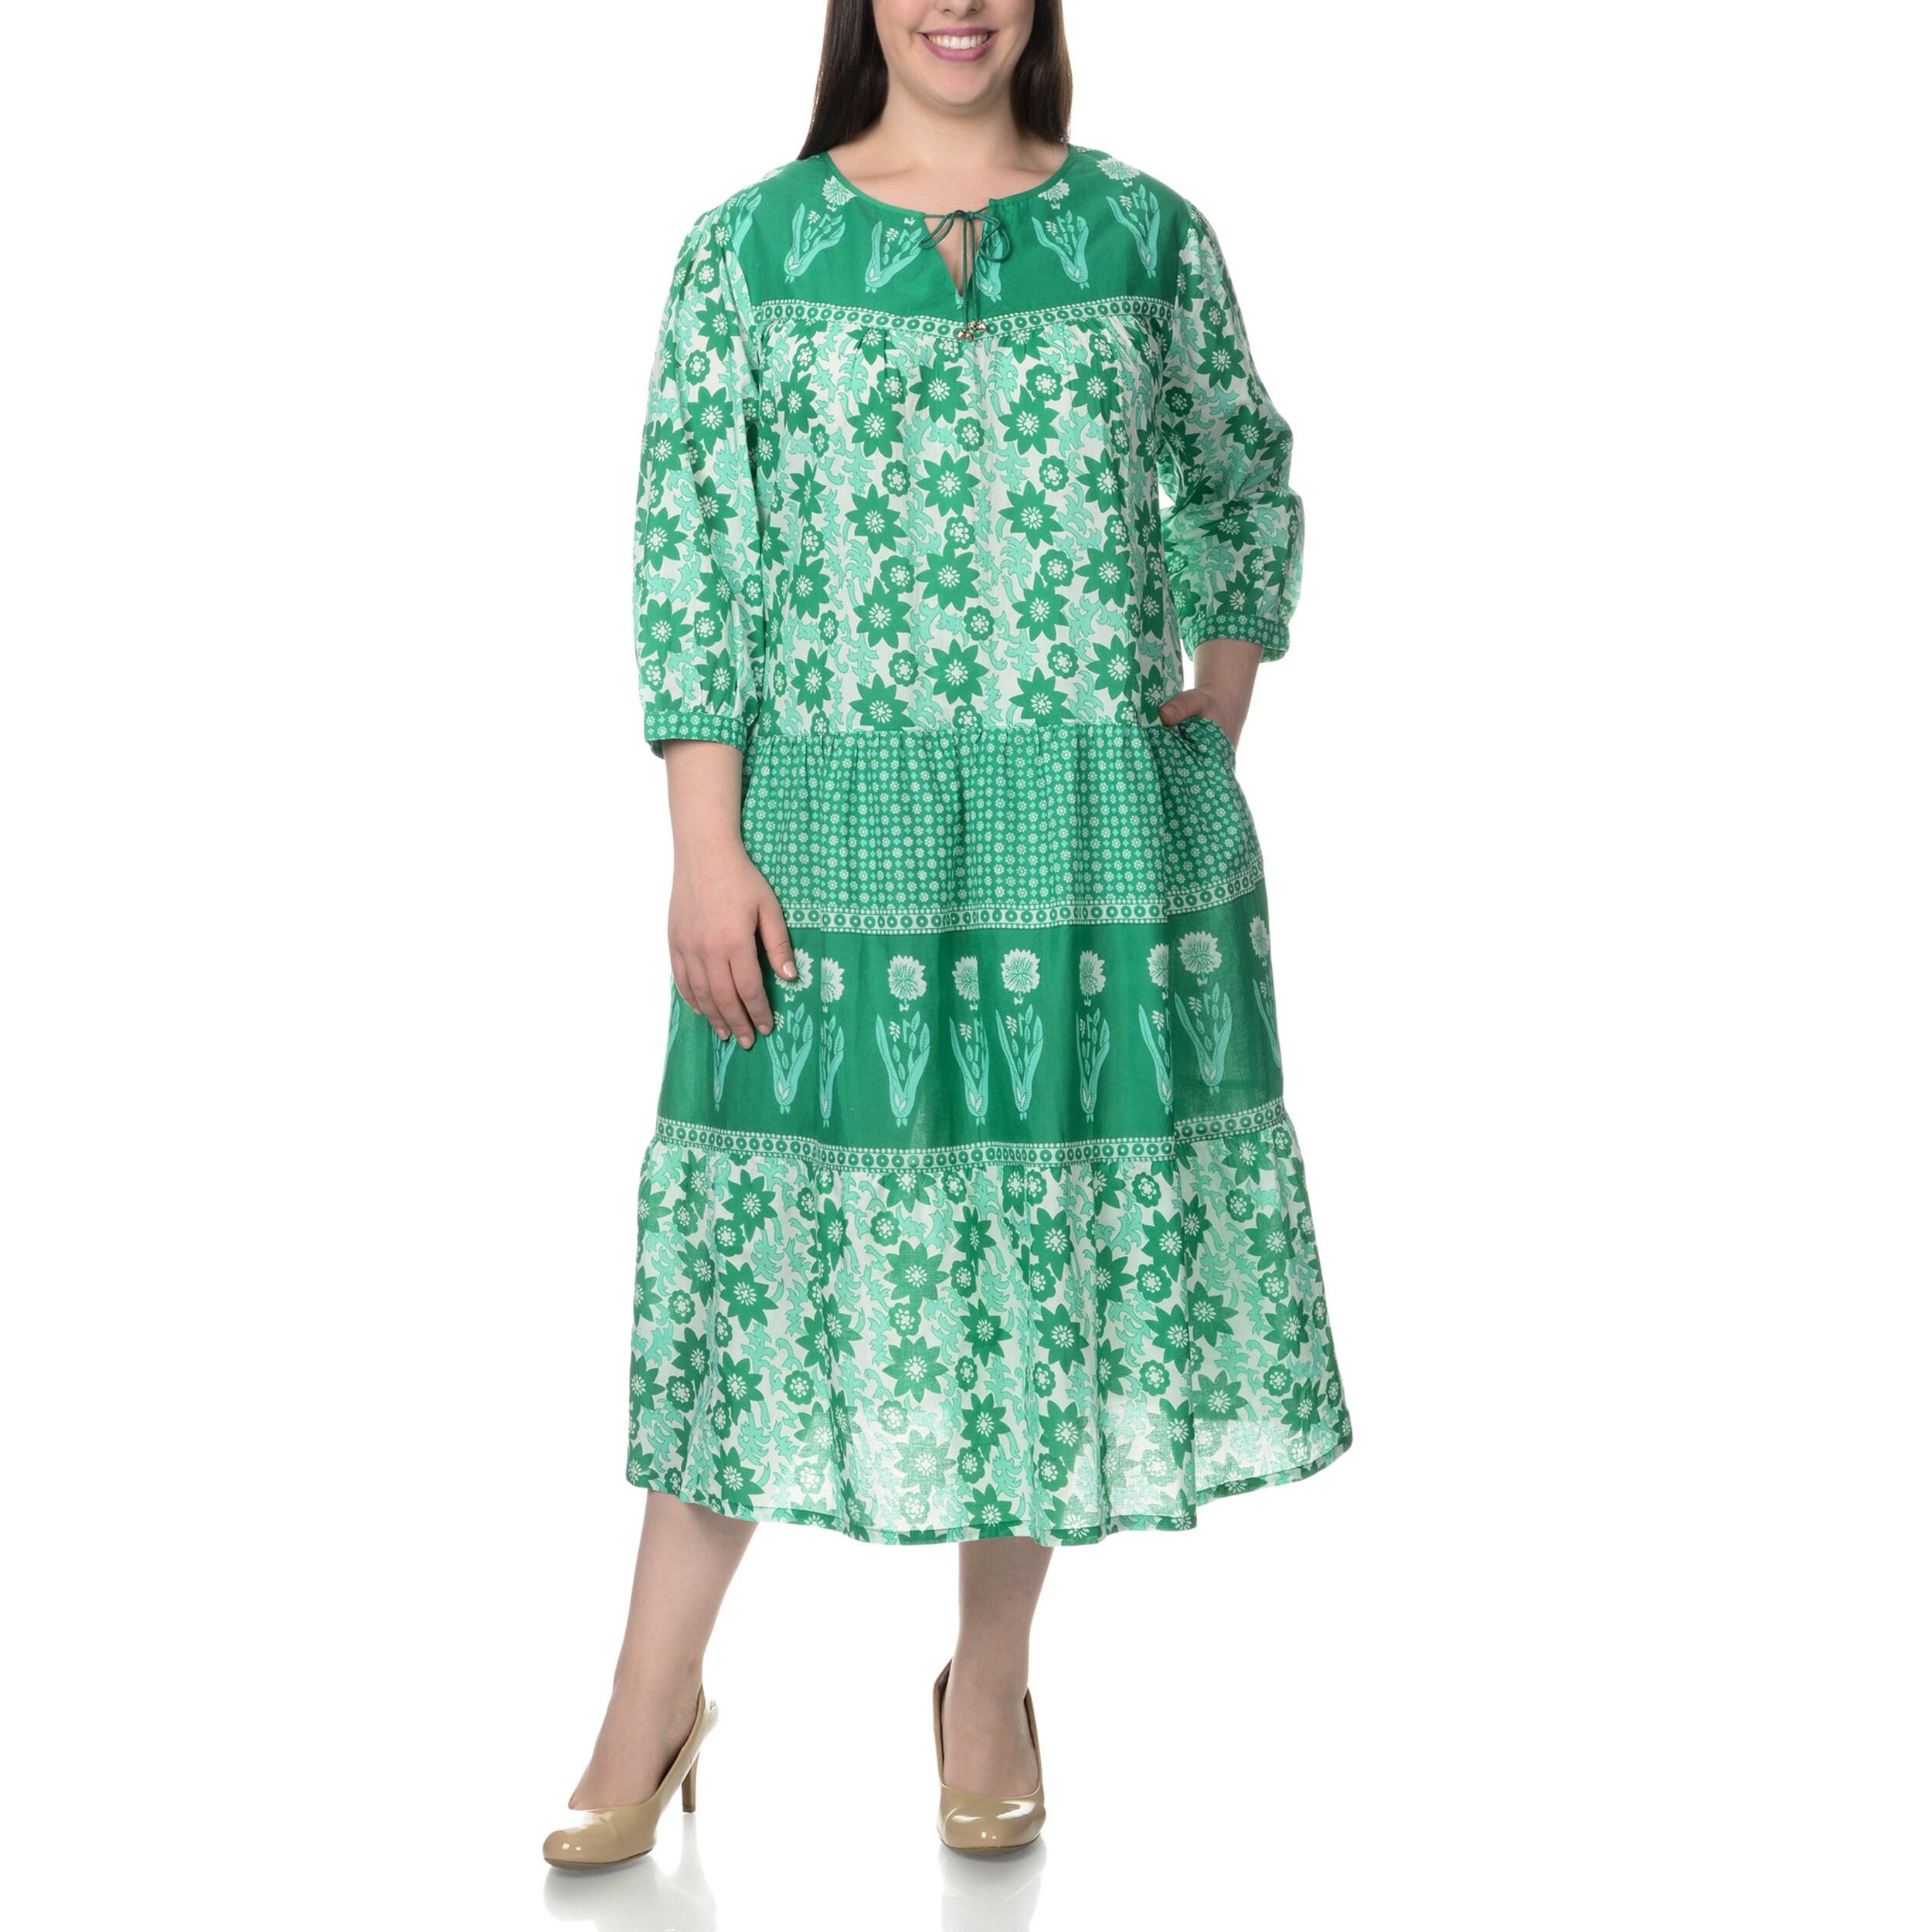 La Cera Womens Plus Size Novelty Floral Print 34 Length Sleeve